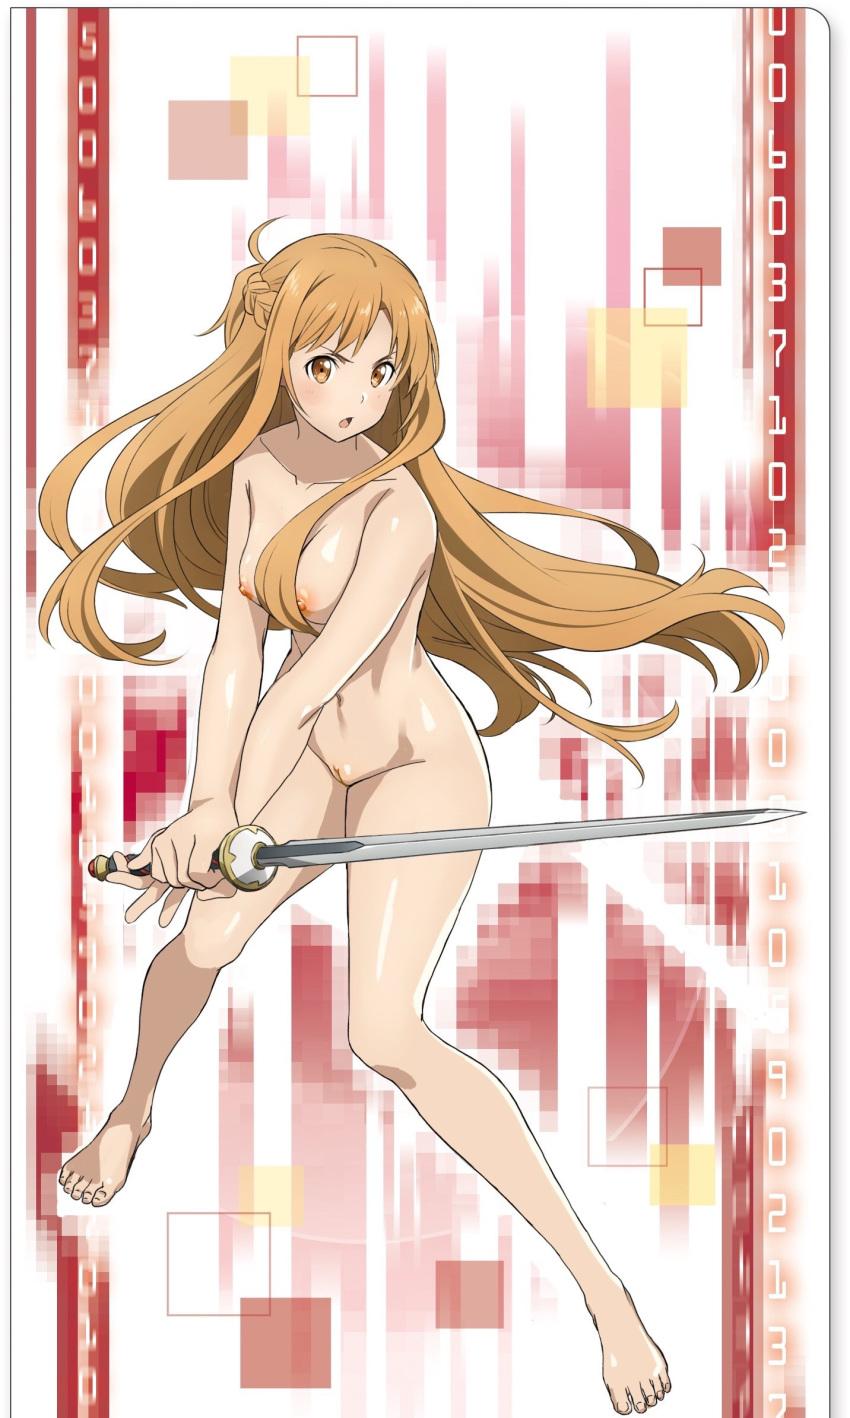 online yuuki nude art sword Witcher 3 where is ciri